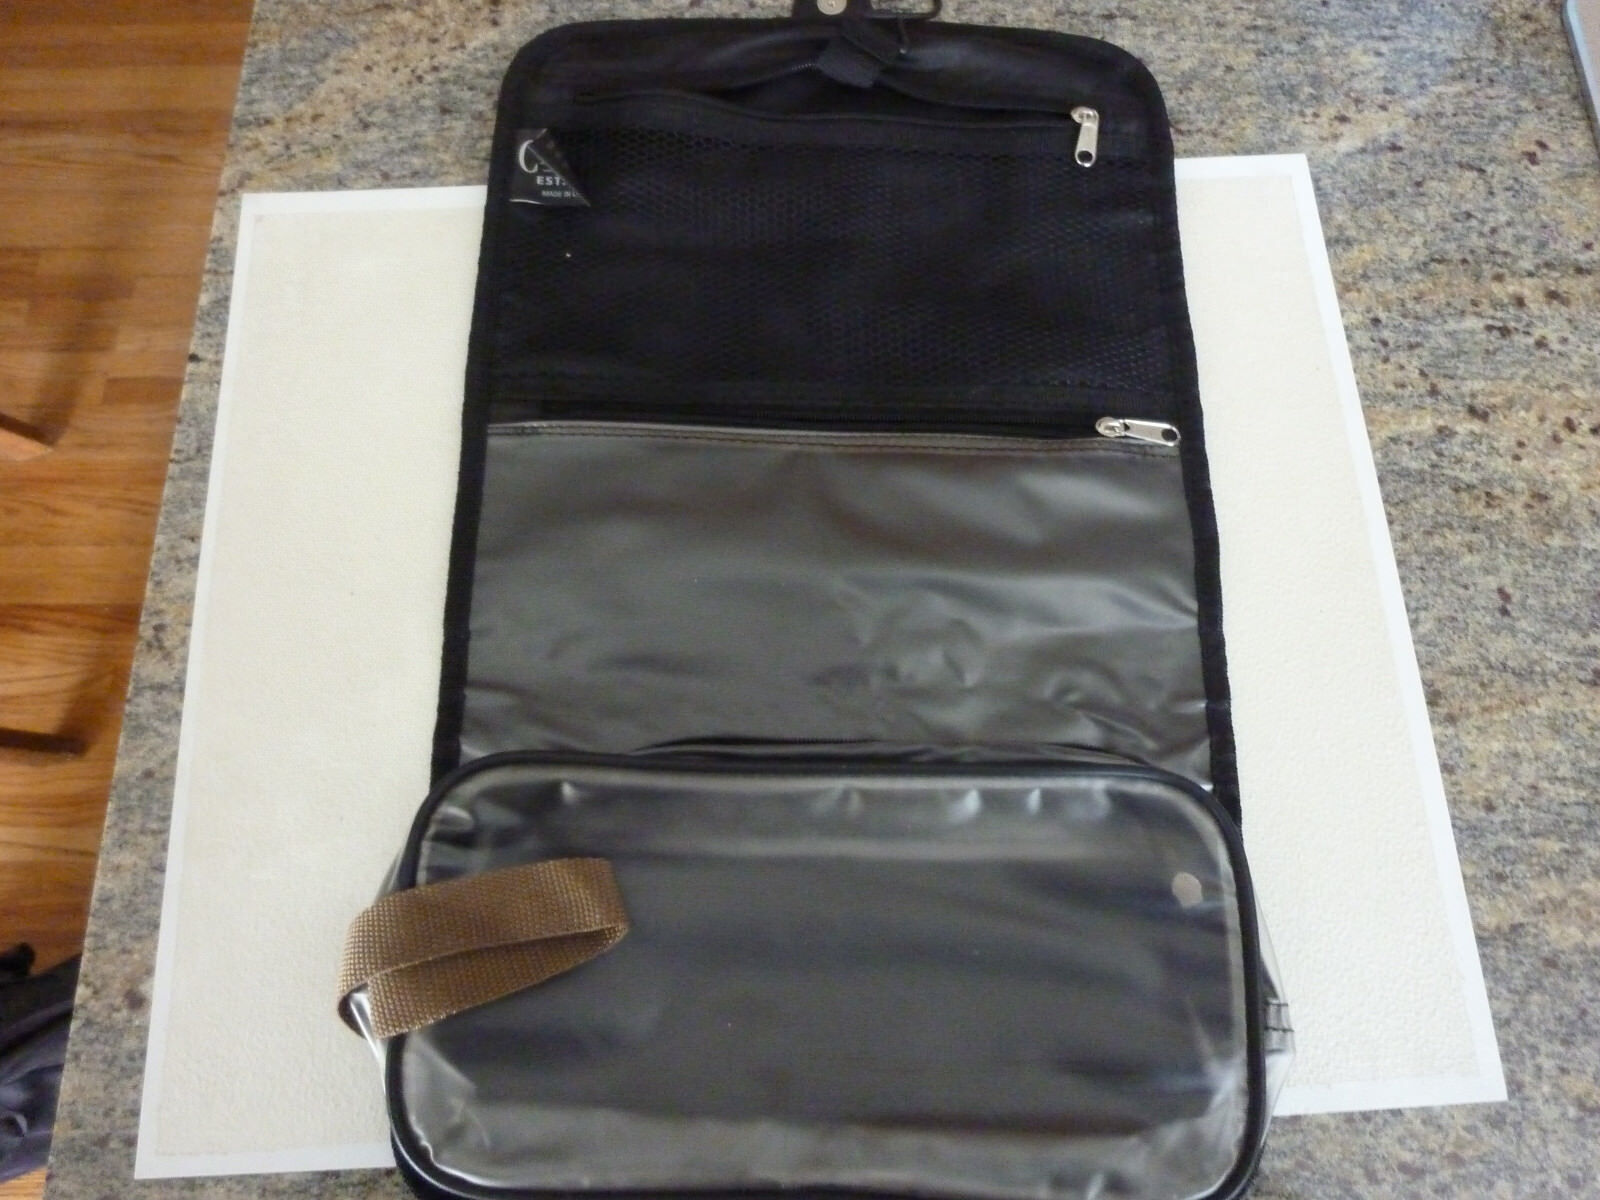 Chaps Black Canvas Hanging Folding Toiletry Travel Bag Case - $8.85